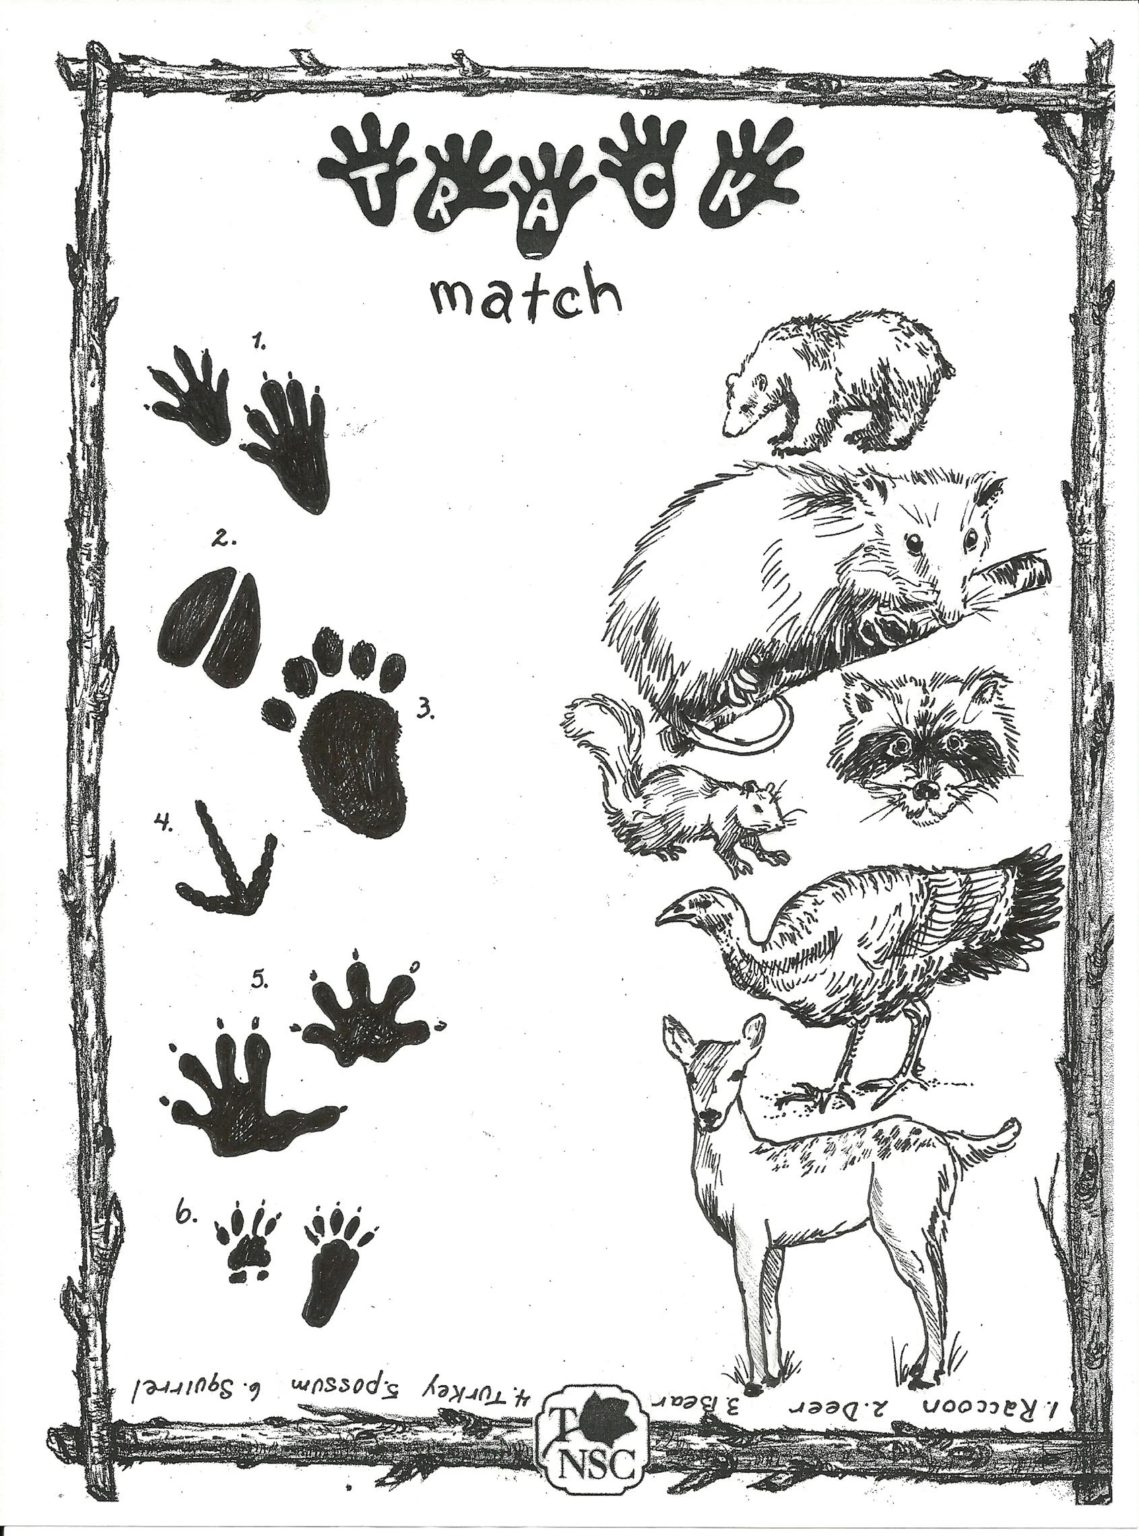 Website animal tracks match